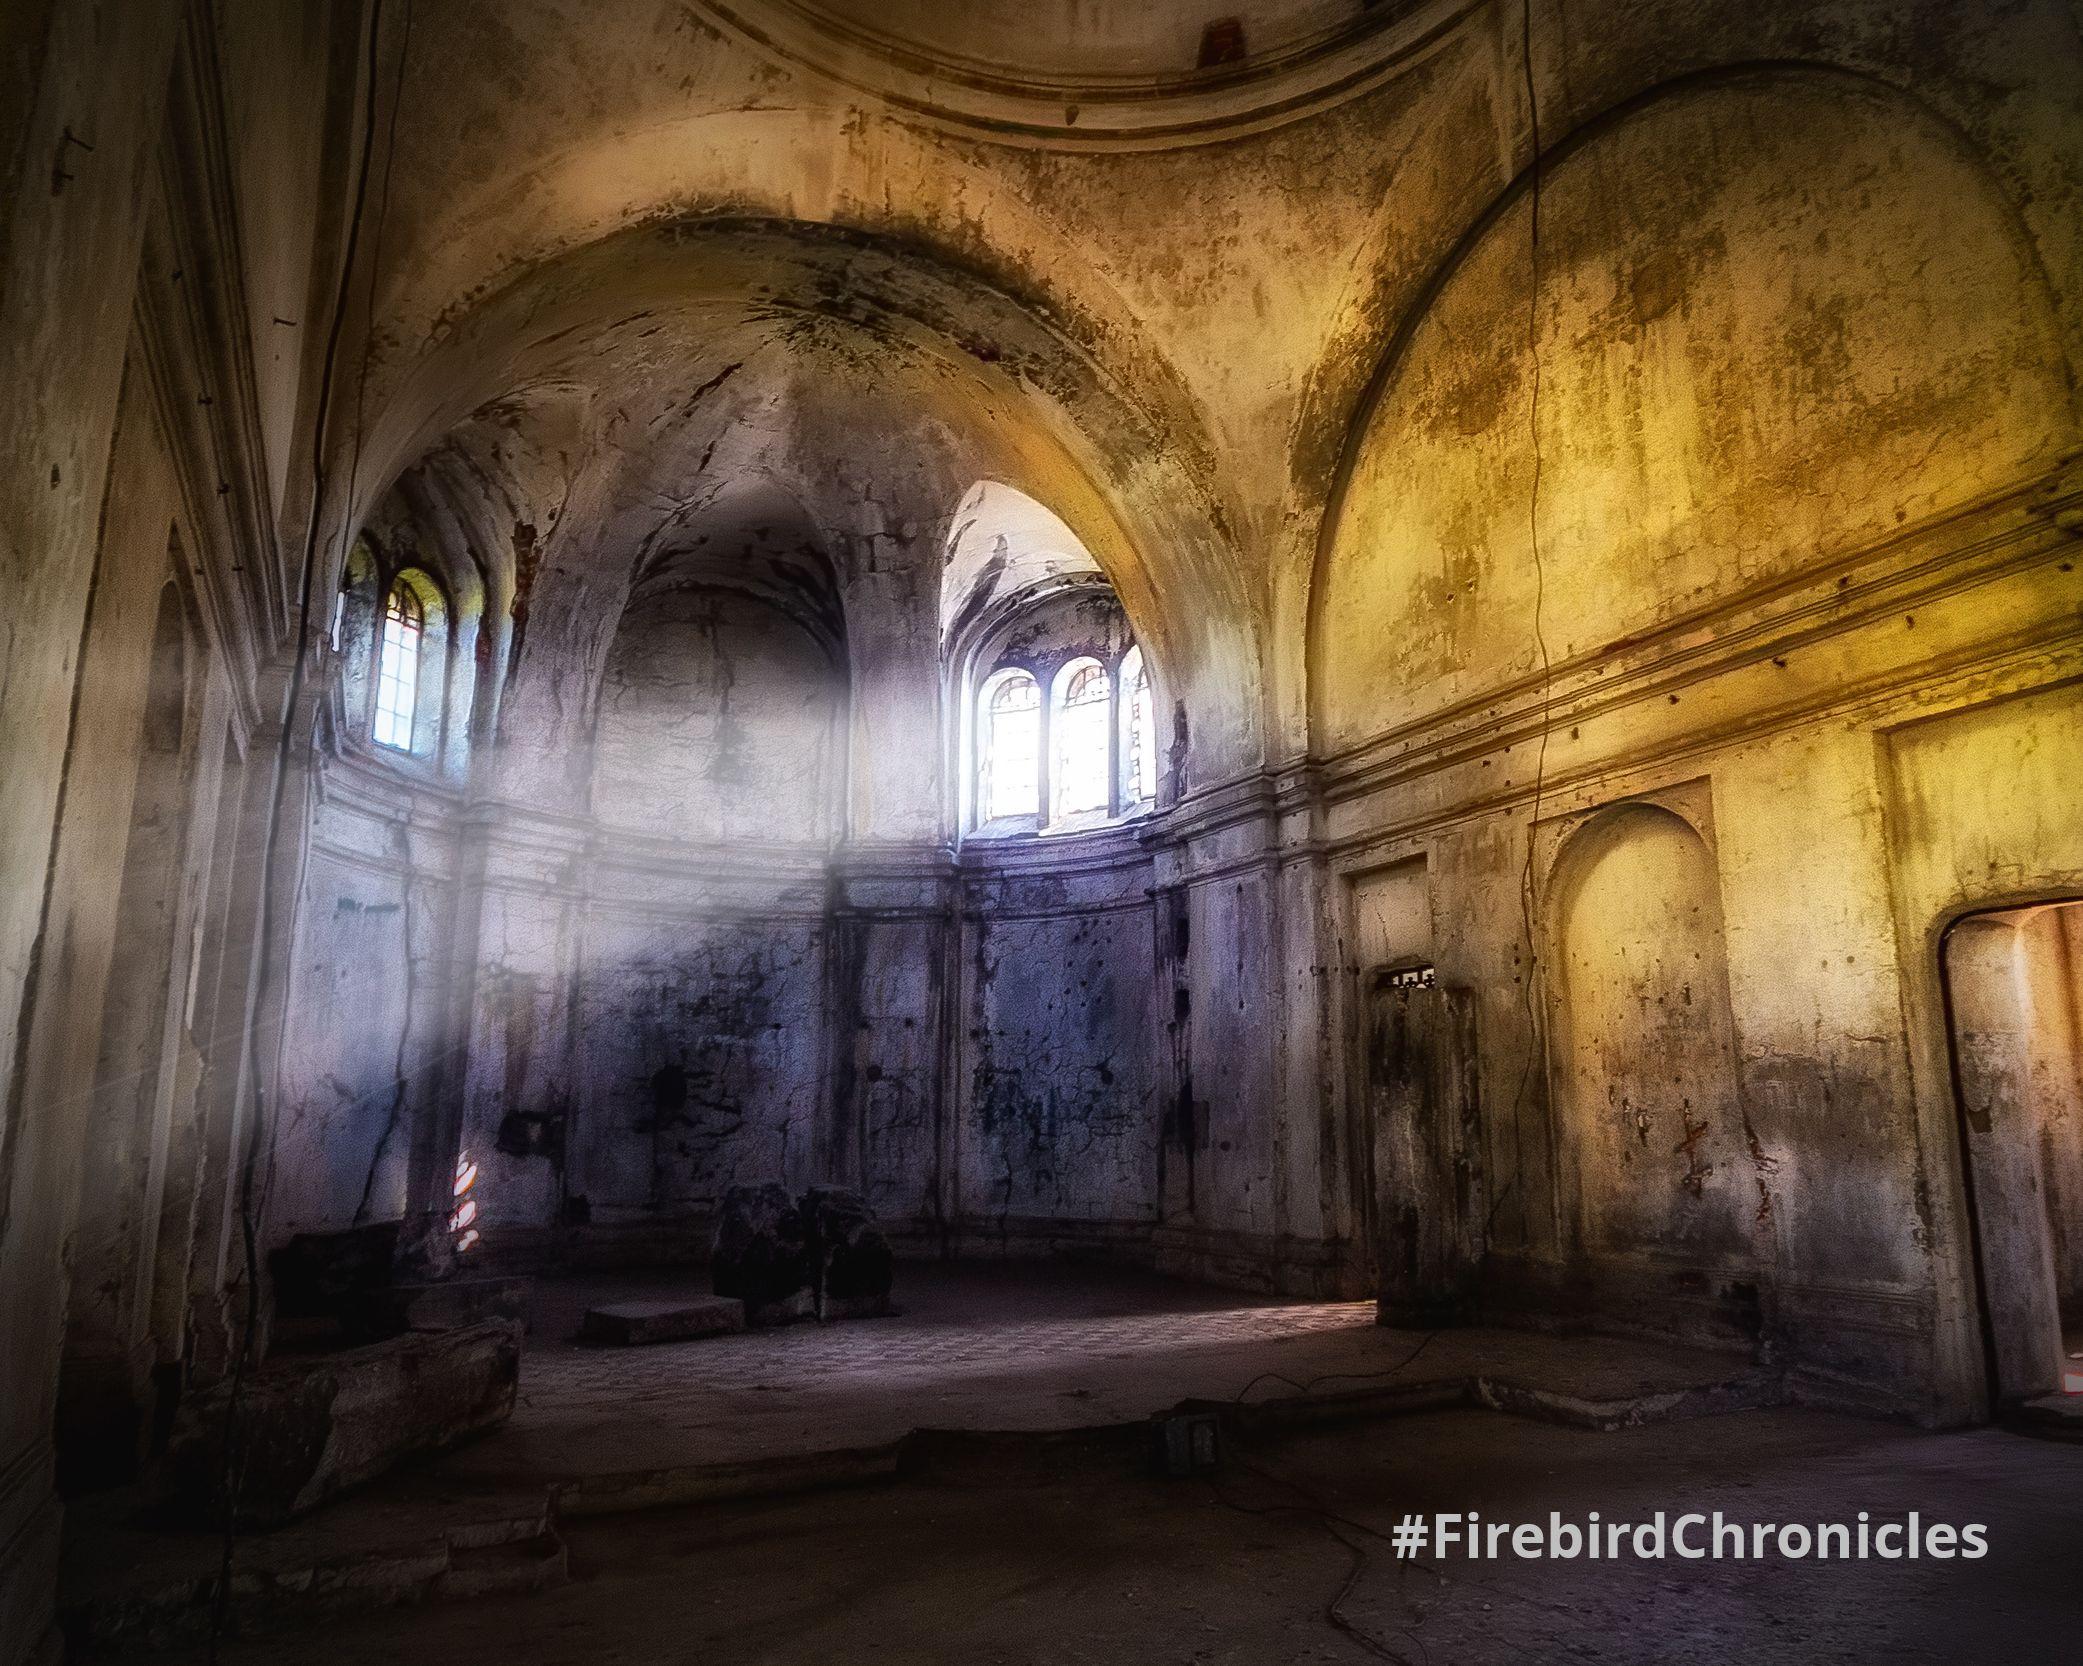 cathedral_abandoned_adobestock_170499847.jpeg